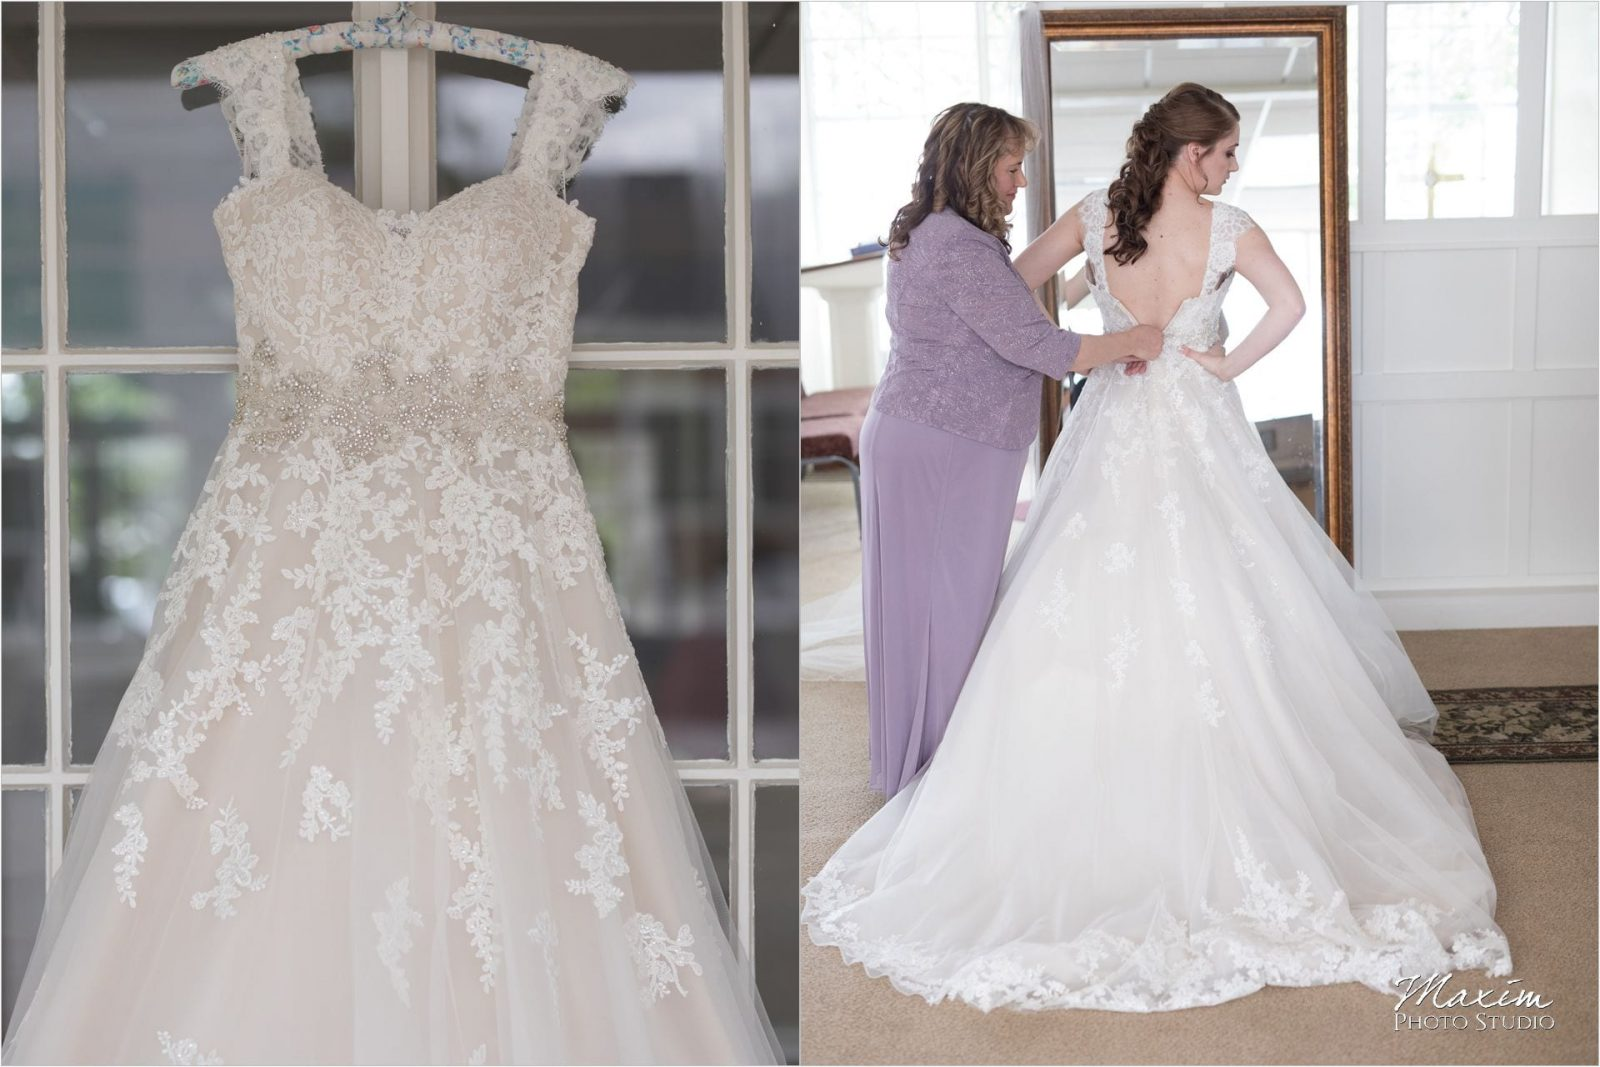 Norlyn Manor, Cincinnati Wedding Photography, Bride preparations, Faboulous Bridal Wedding Dress